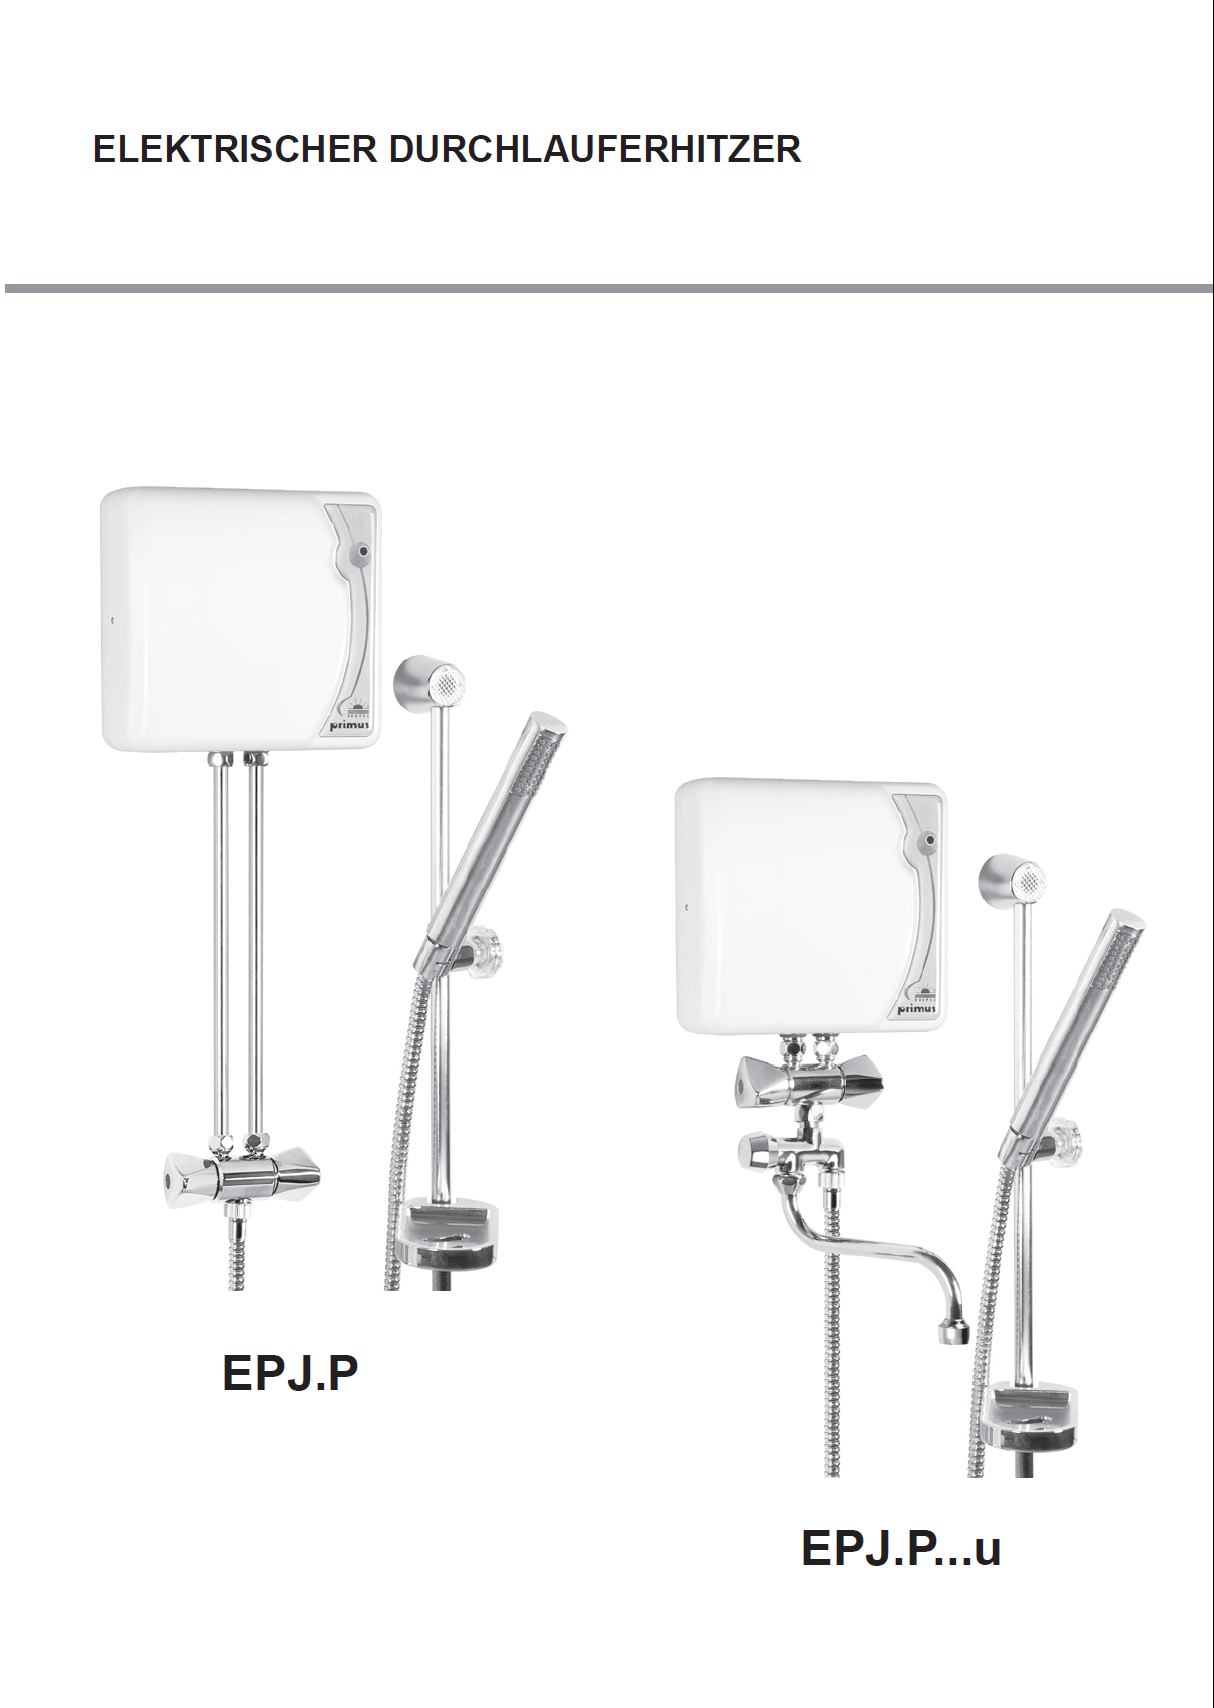 Bedienungsanleitung EPJ.P & EPJ.P.uPrimus .pdf